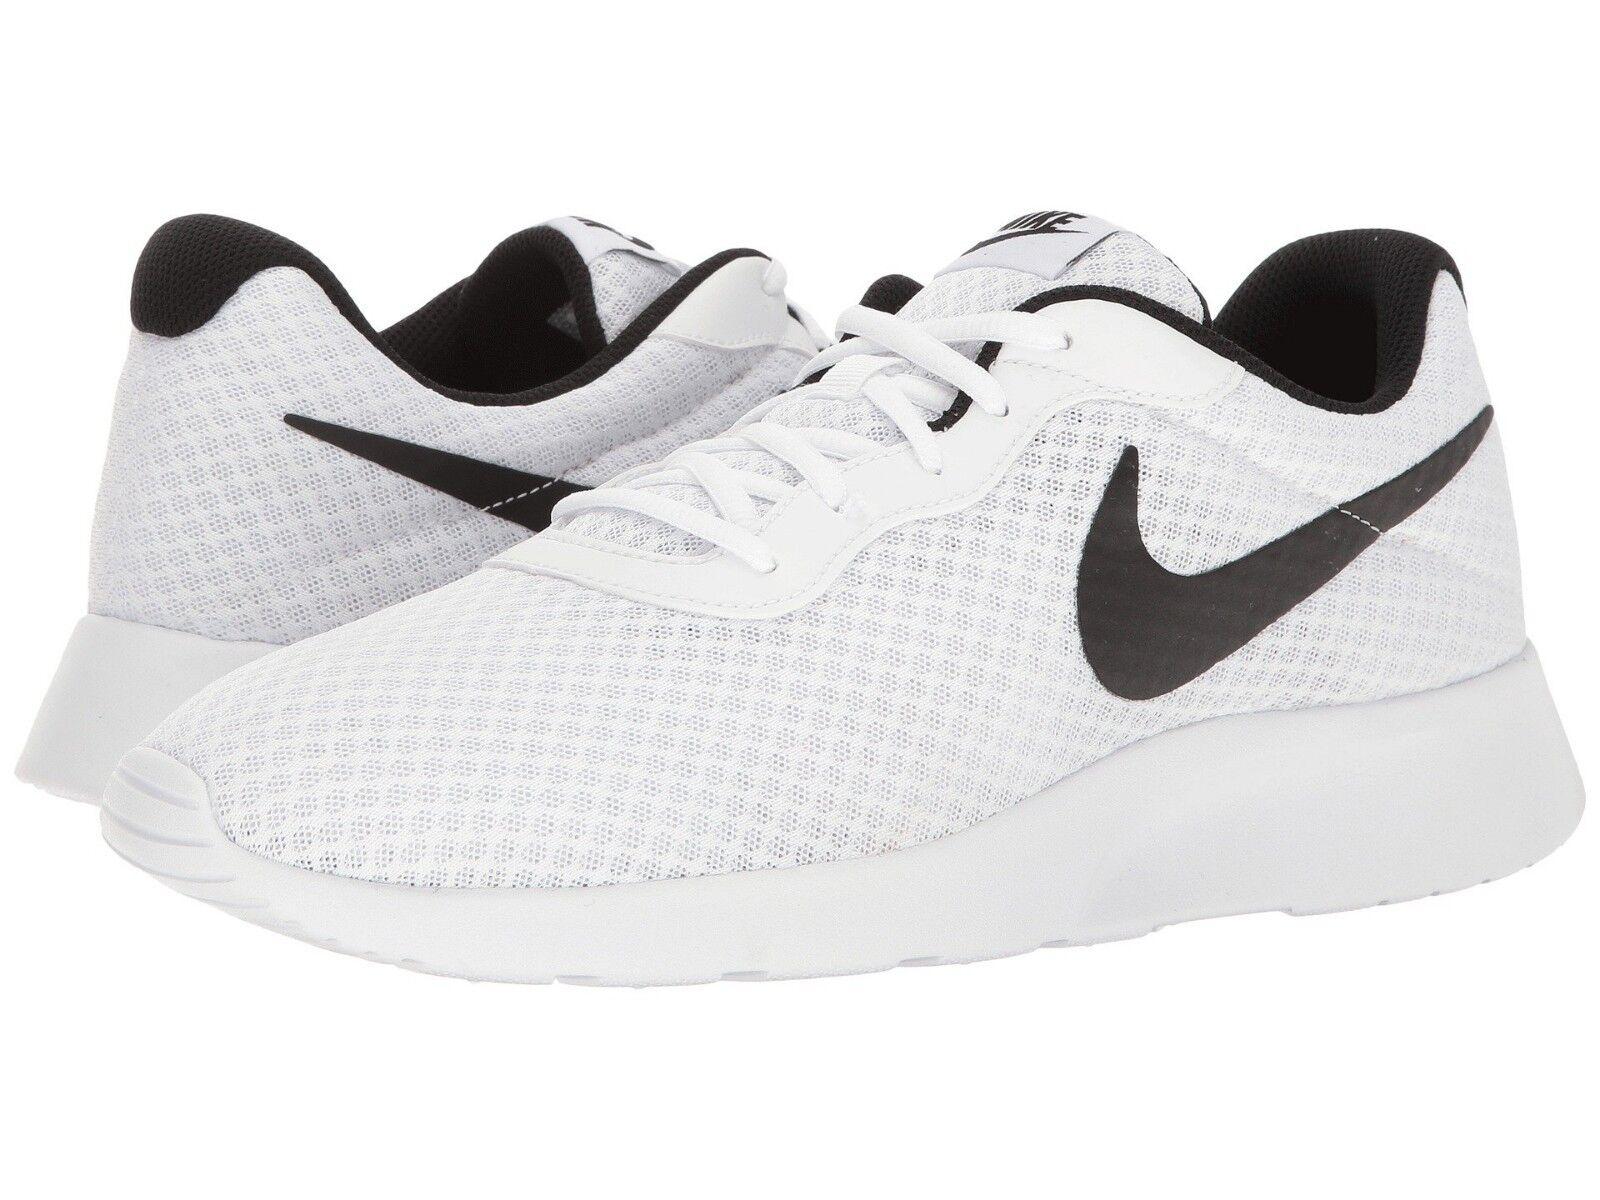 Nike TANJUN Mens White Black 812654-101 Lace Up Casual shoes